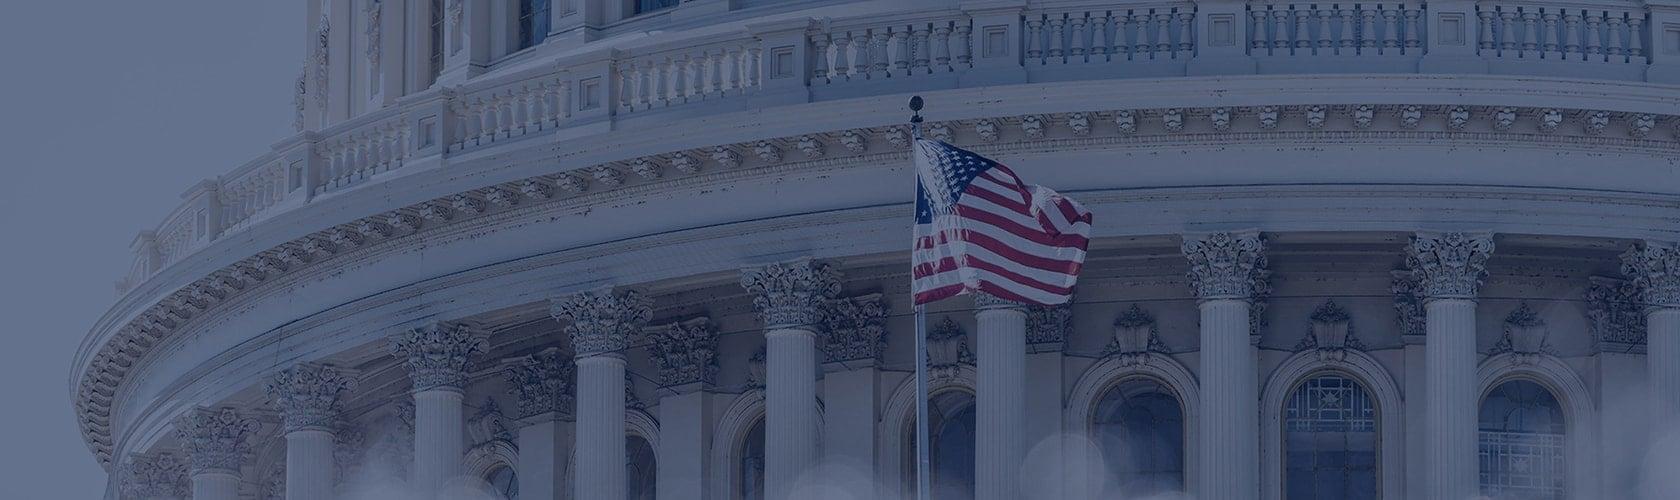 About USA-IT Anti Illegal Trade Initiative